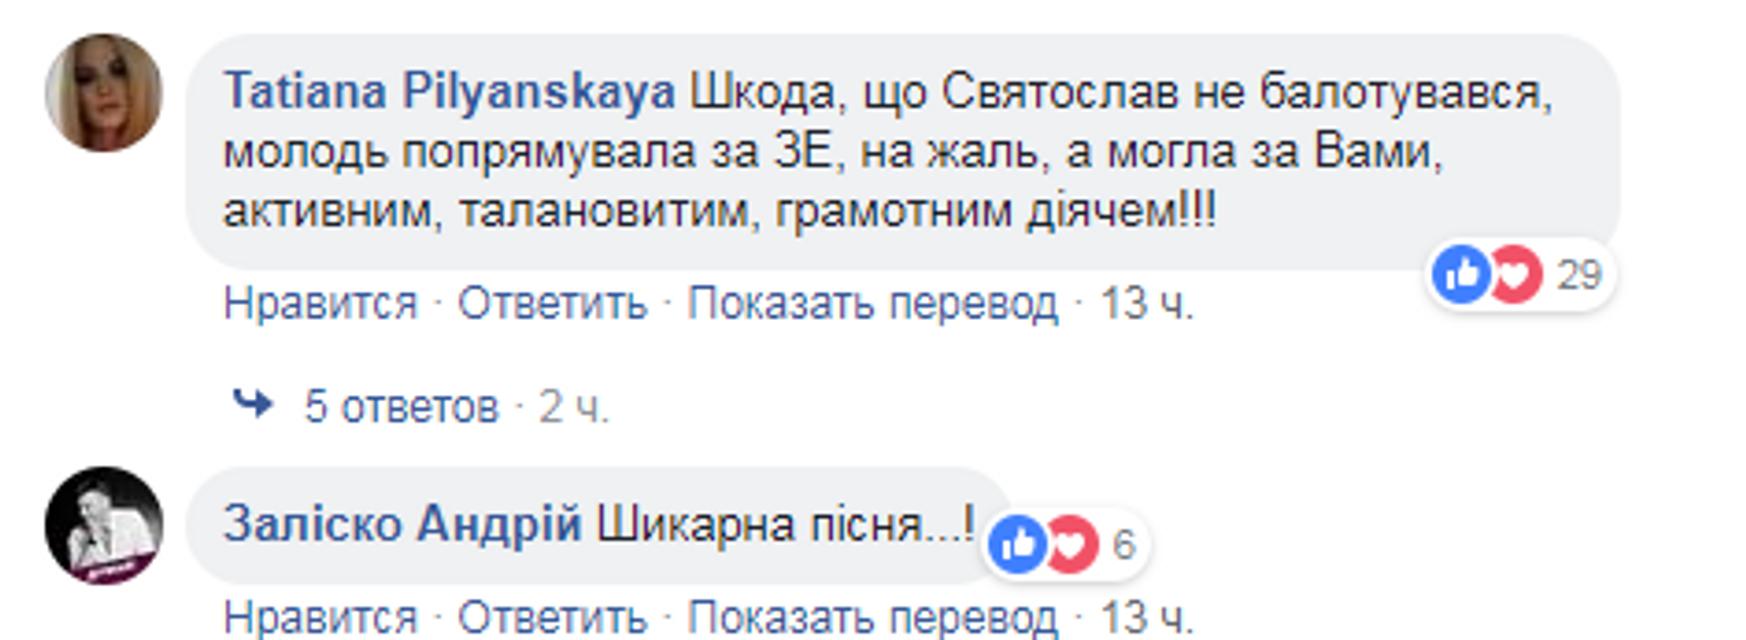 Вакарчук vs Зеленский: певец запустил новый флешмоб - ФОТО - фото 178477